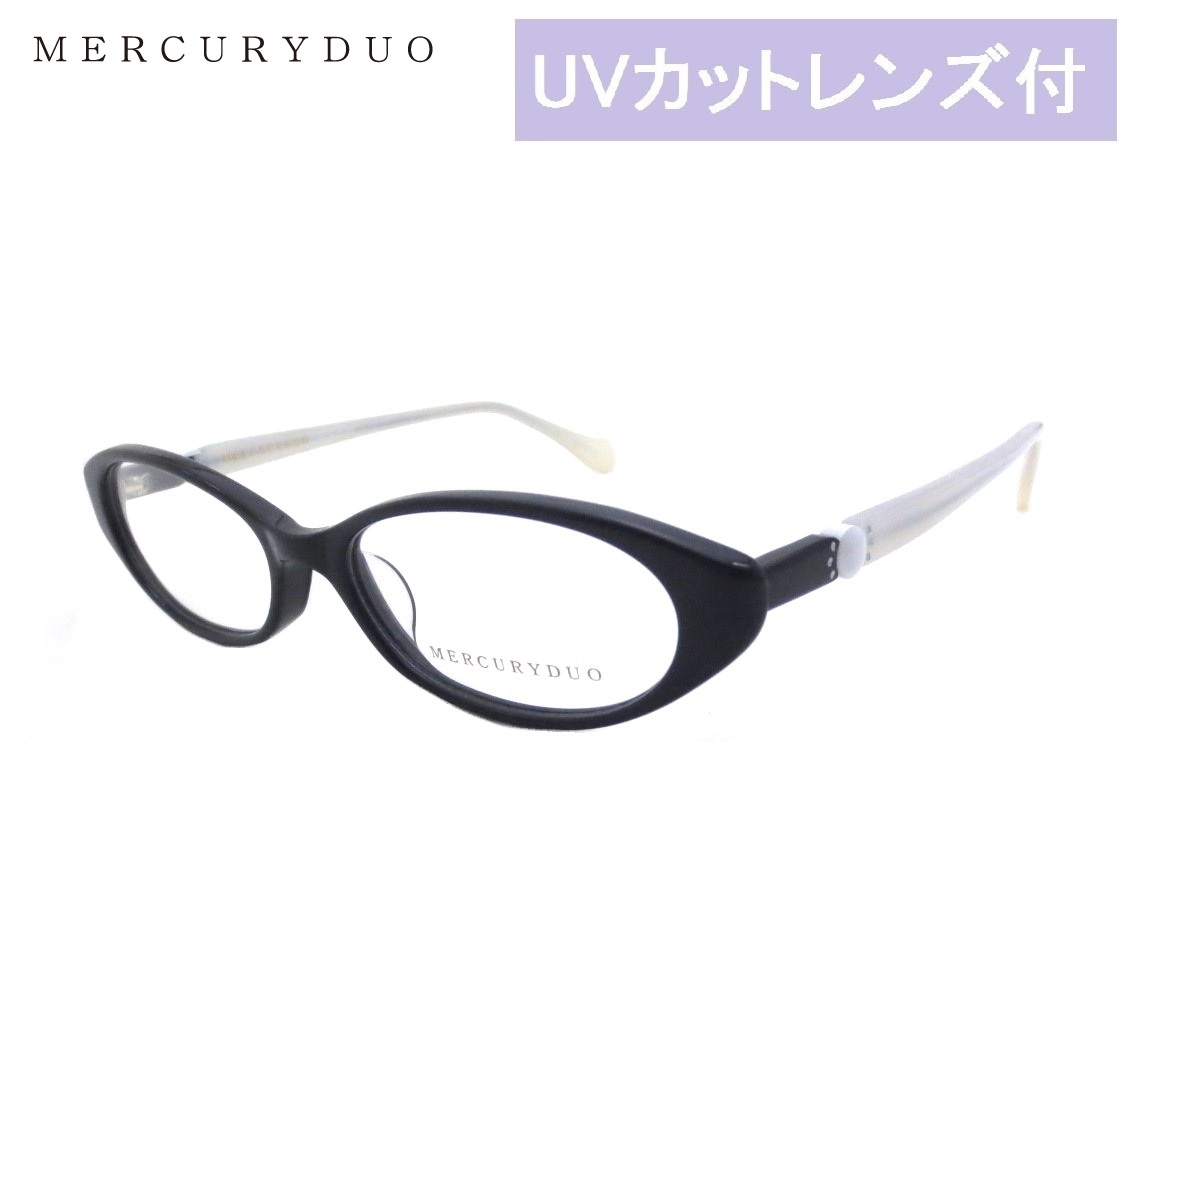 MERCURYDUO(マーキュリーデュオ)MDF8009 01(52)セミオーダー老眼鏡 中間度数有 UVカット(UV400)&防汚コート付レンズ +1.00 +1.25 +1.50 +1.75 +2.00 +2.25 +2.50 +2.75 +3.00 +3.50 +4.00【コンビニ受取対応商品】